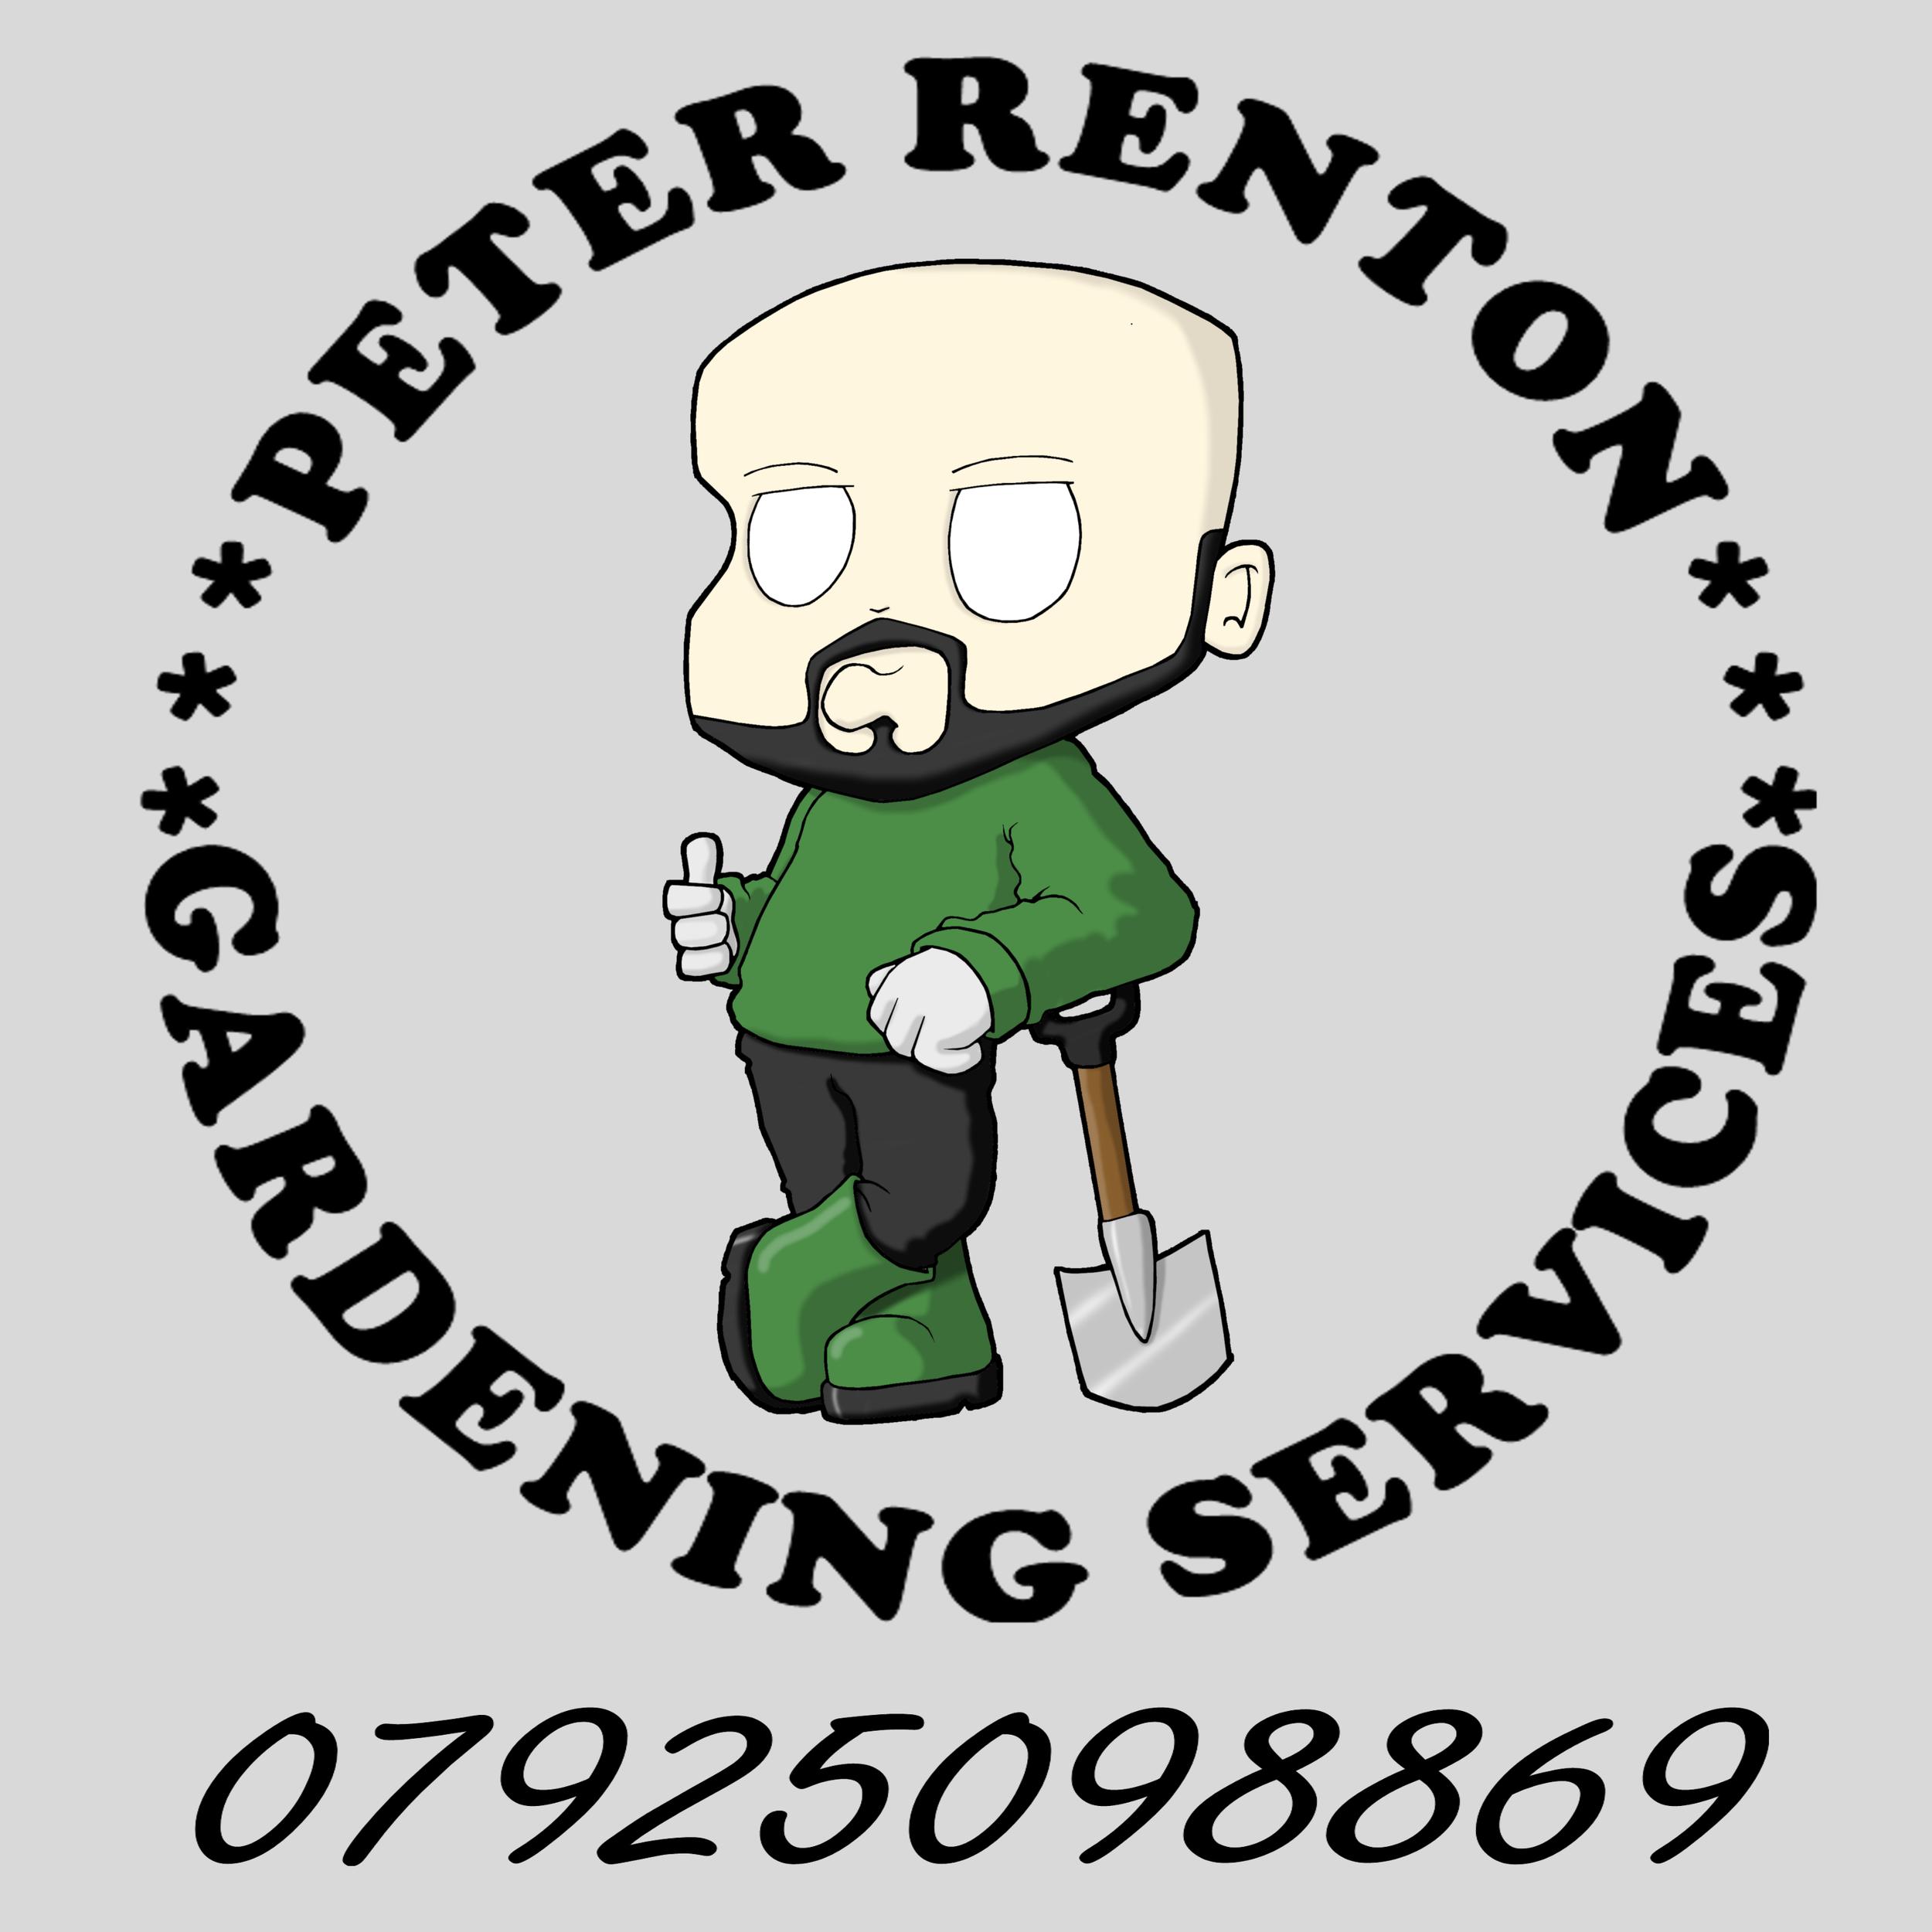 Peter Renton - Gardening Services Logo 03 with number Grey BG.png